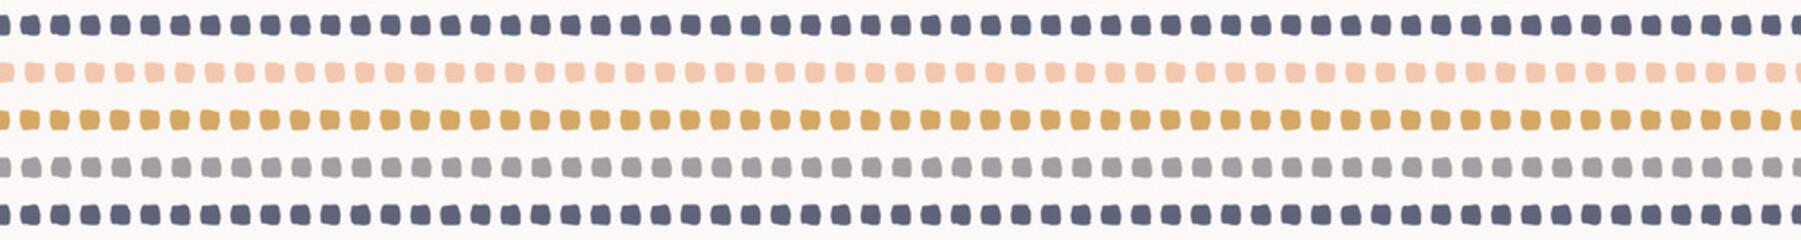 Hand drawn graphic doodle stripes seamless border pattern. Sketchy organic lines edging vector illustration. Modern graphic design. Fresh gender neutral scandi style scribble. Kid decor ribbon trim